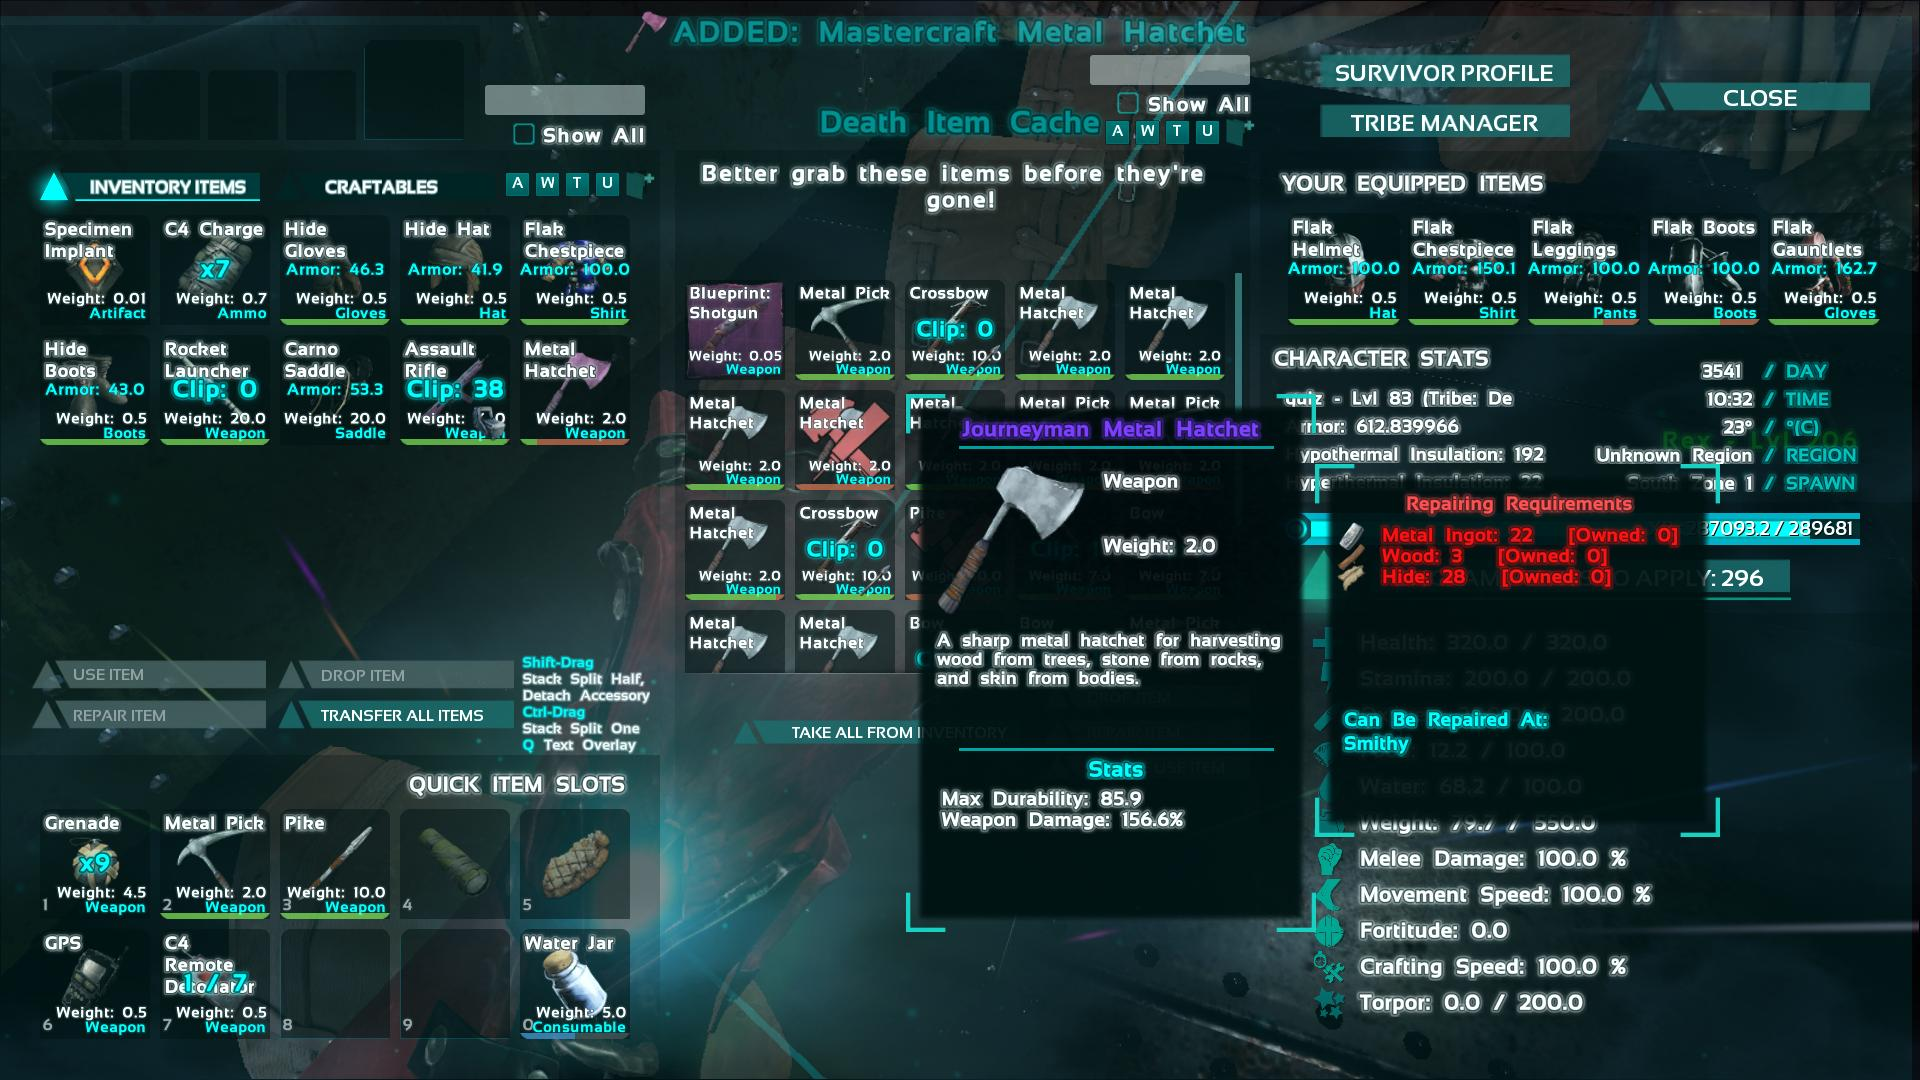 Journeyman metal hatchet ark screenshot gamingcfg journeyman metal hatchet ark screenshot malvernweather Choice Image